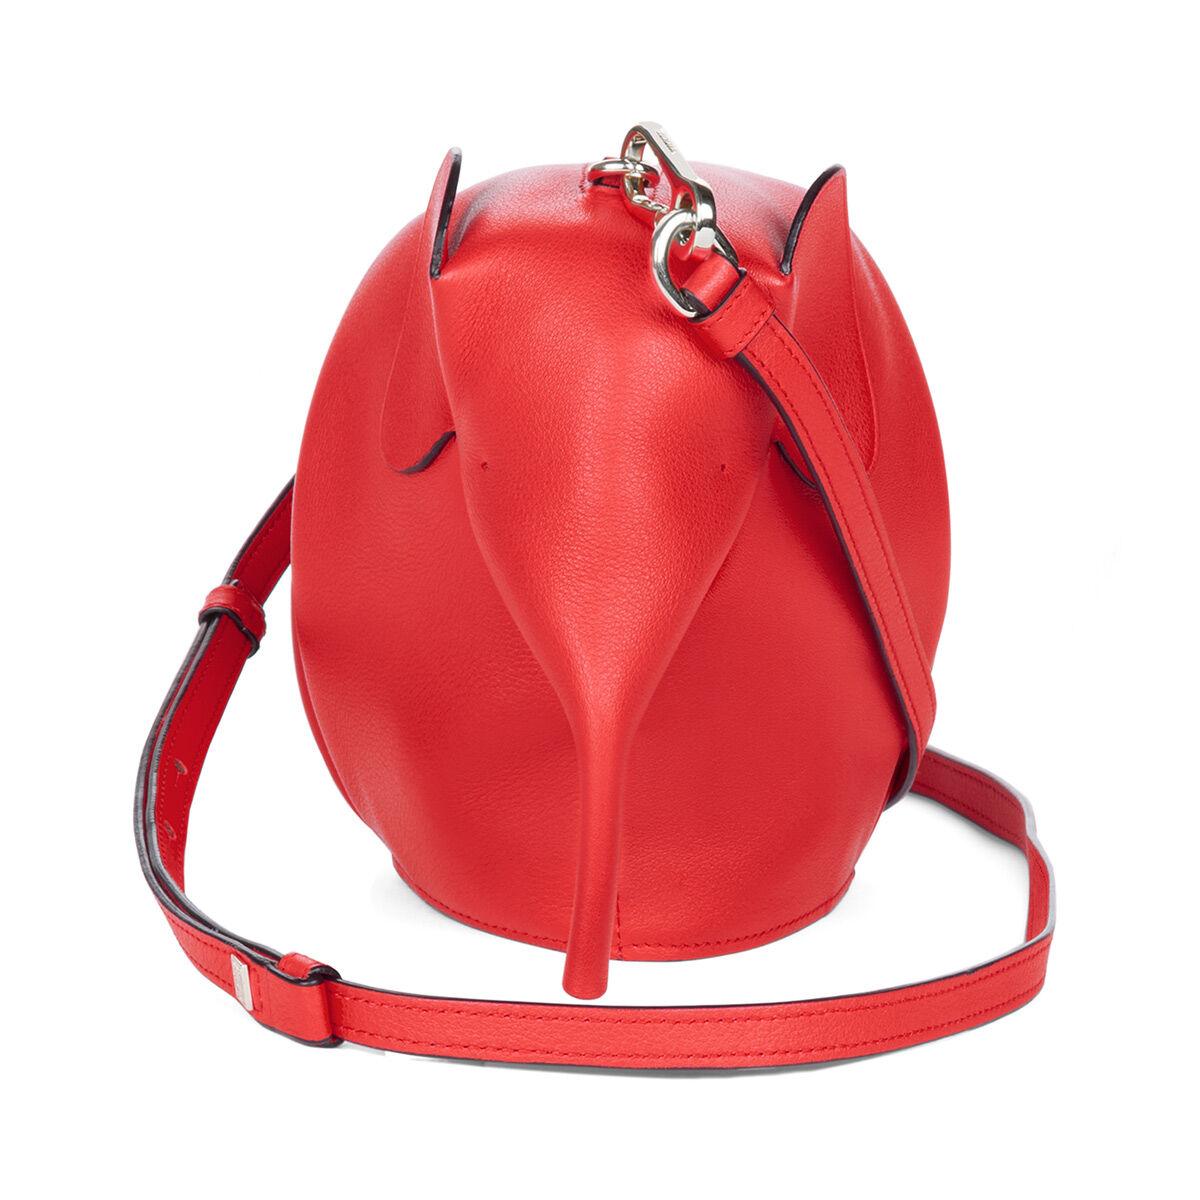 LOEWE Mini Bolso Elefante Rojo Escarlata all